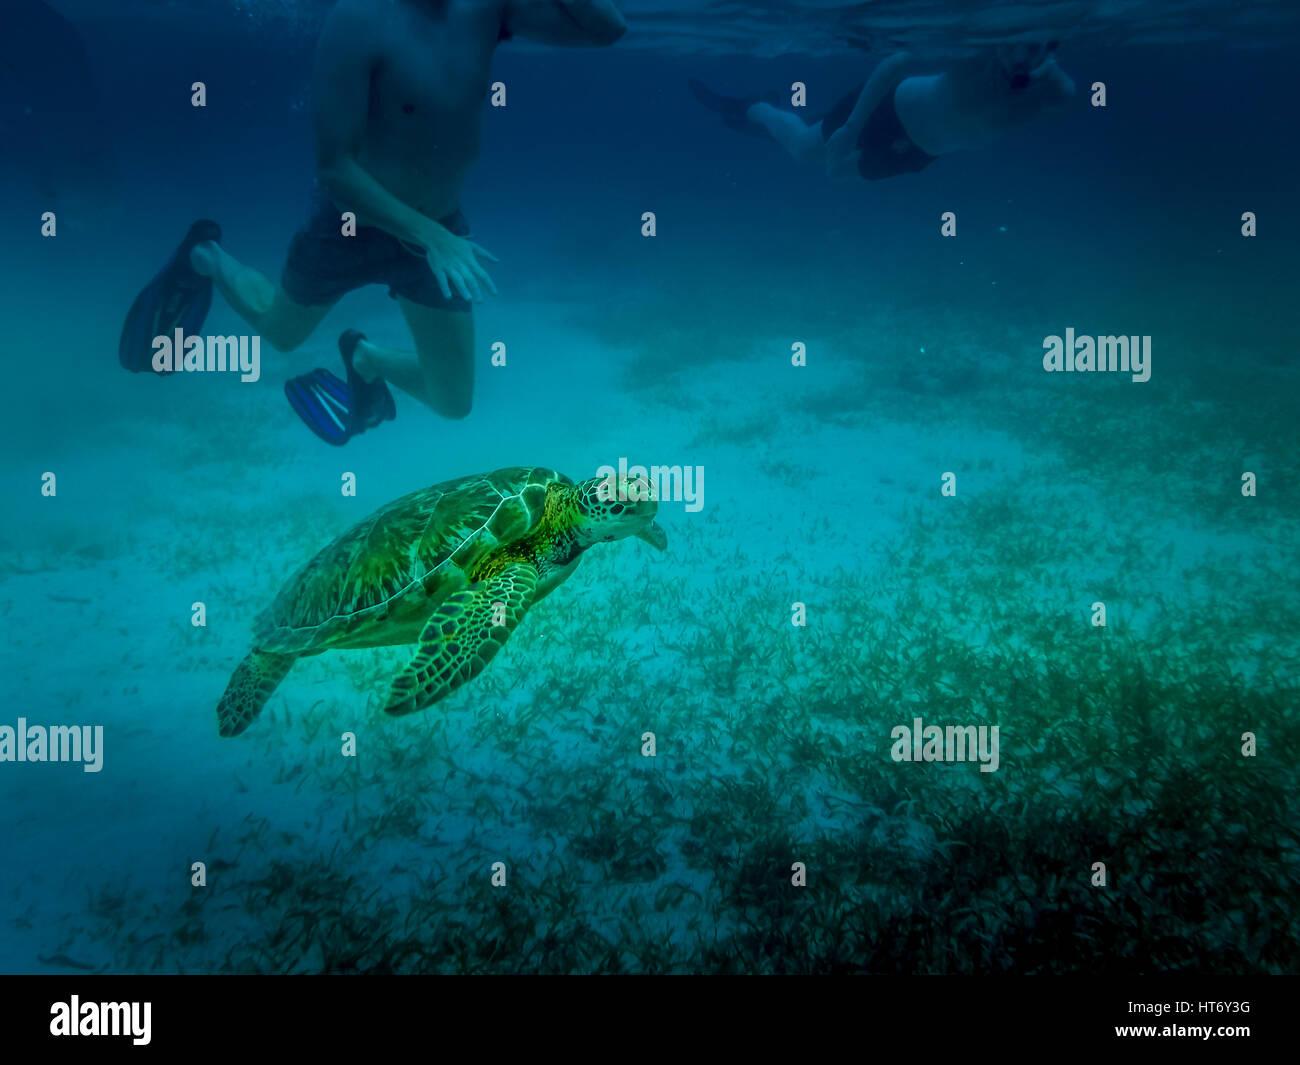 Sea turtle in caribbean sea - Caye Caulker, Belize - Stock Image